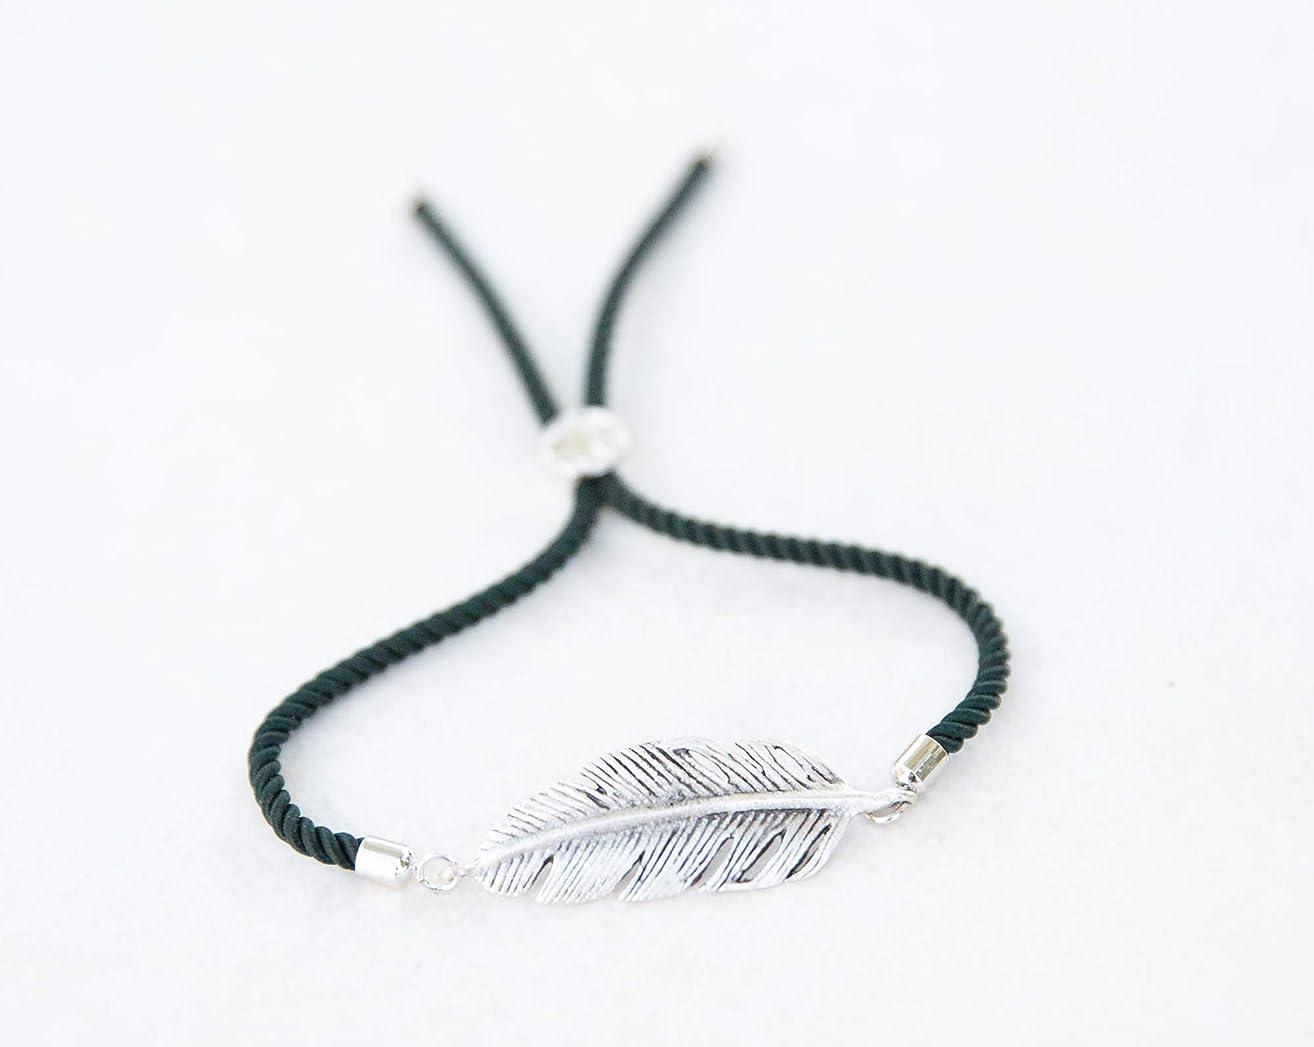 Bolo Silver-tone Feather Slide Bracelet, Custom Colors, Adjustable Bracelet